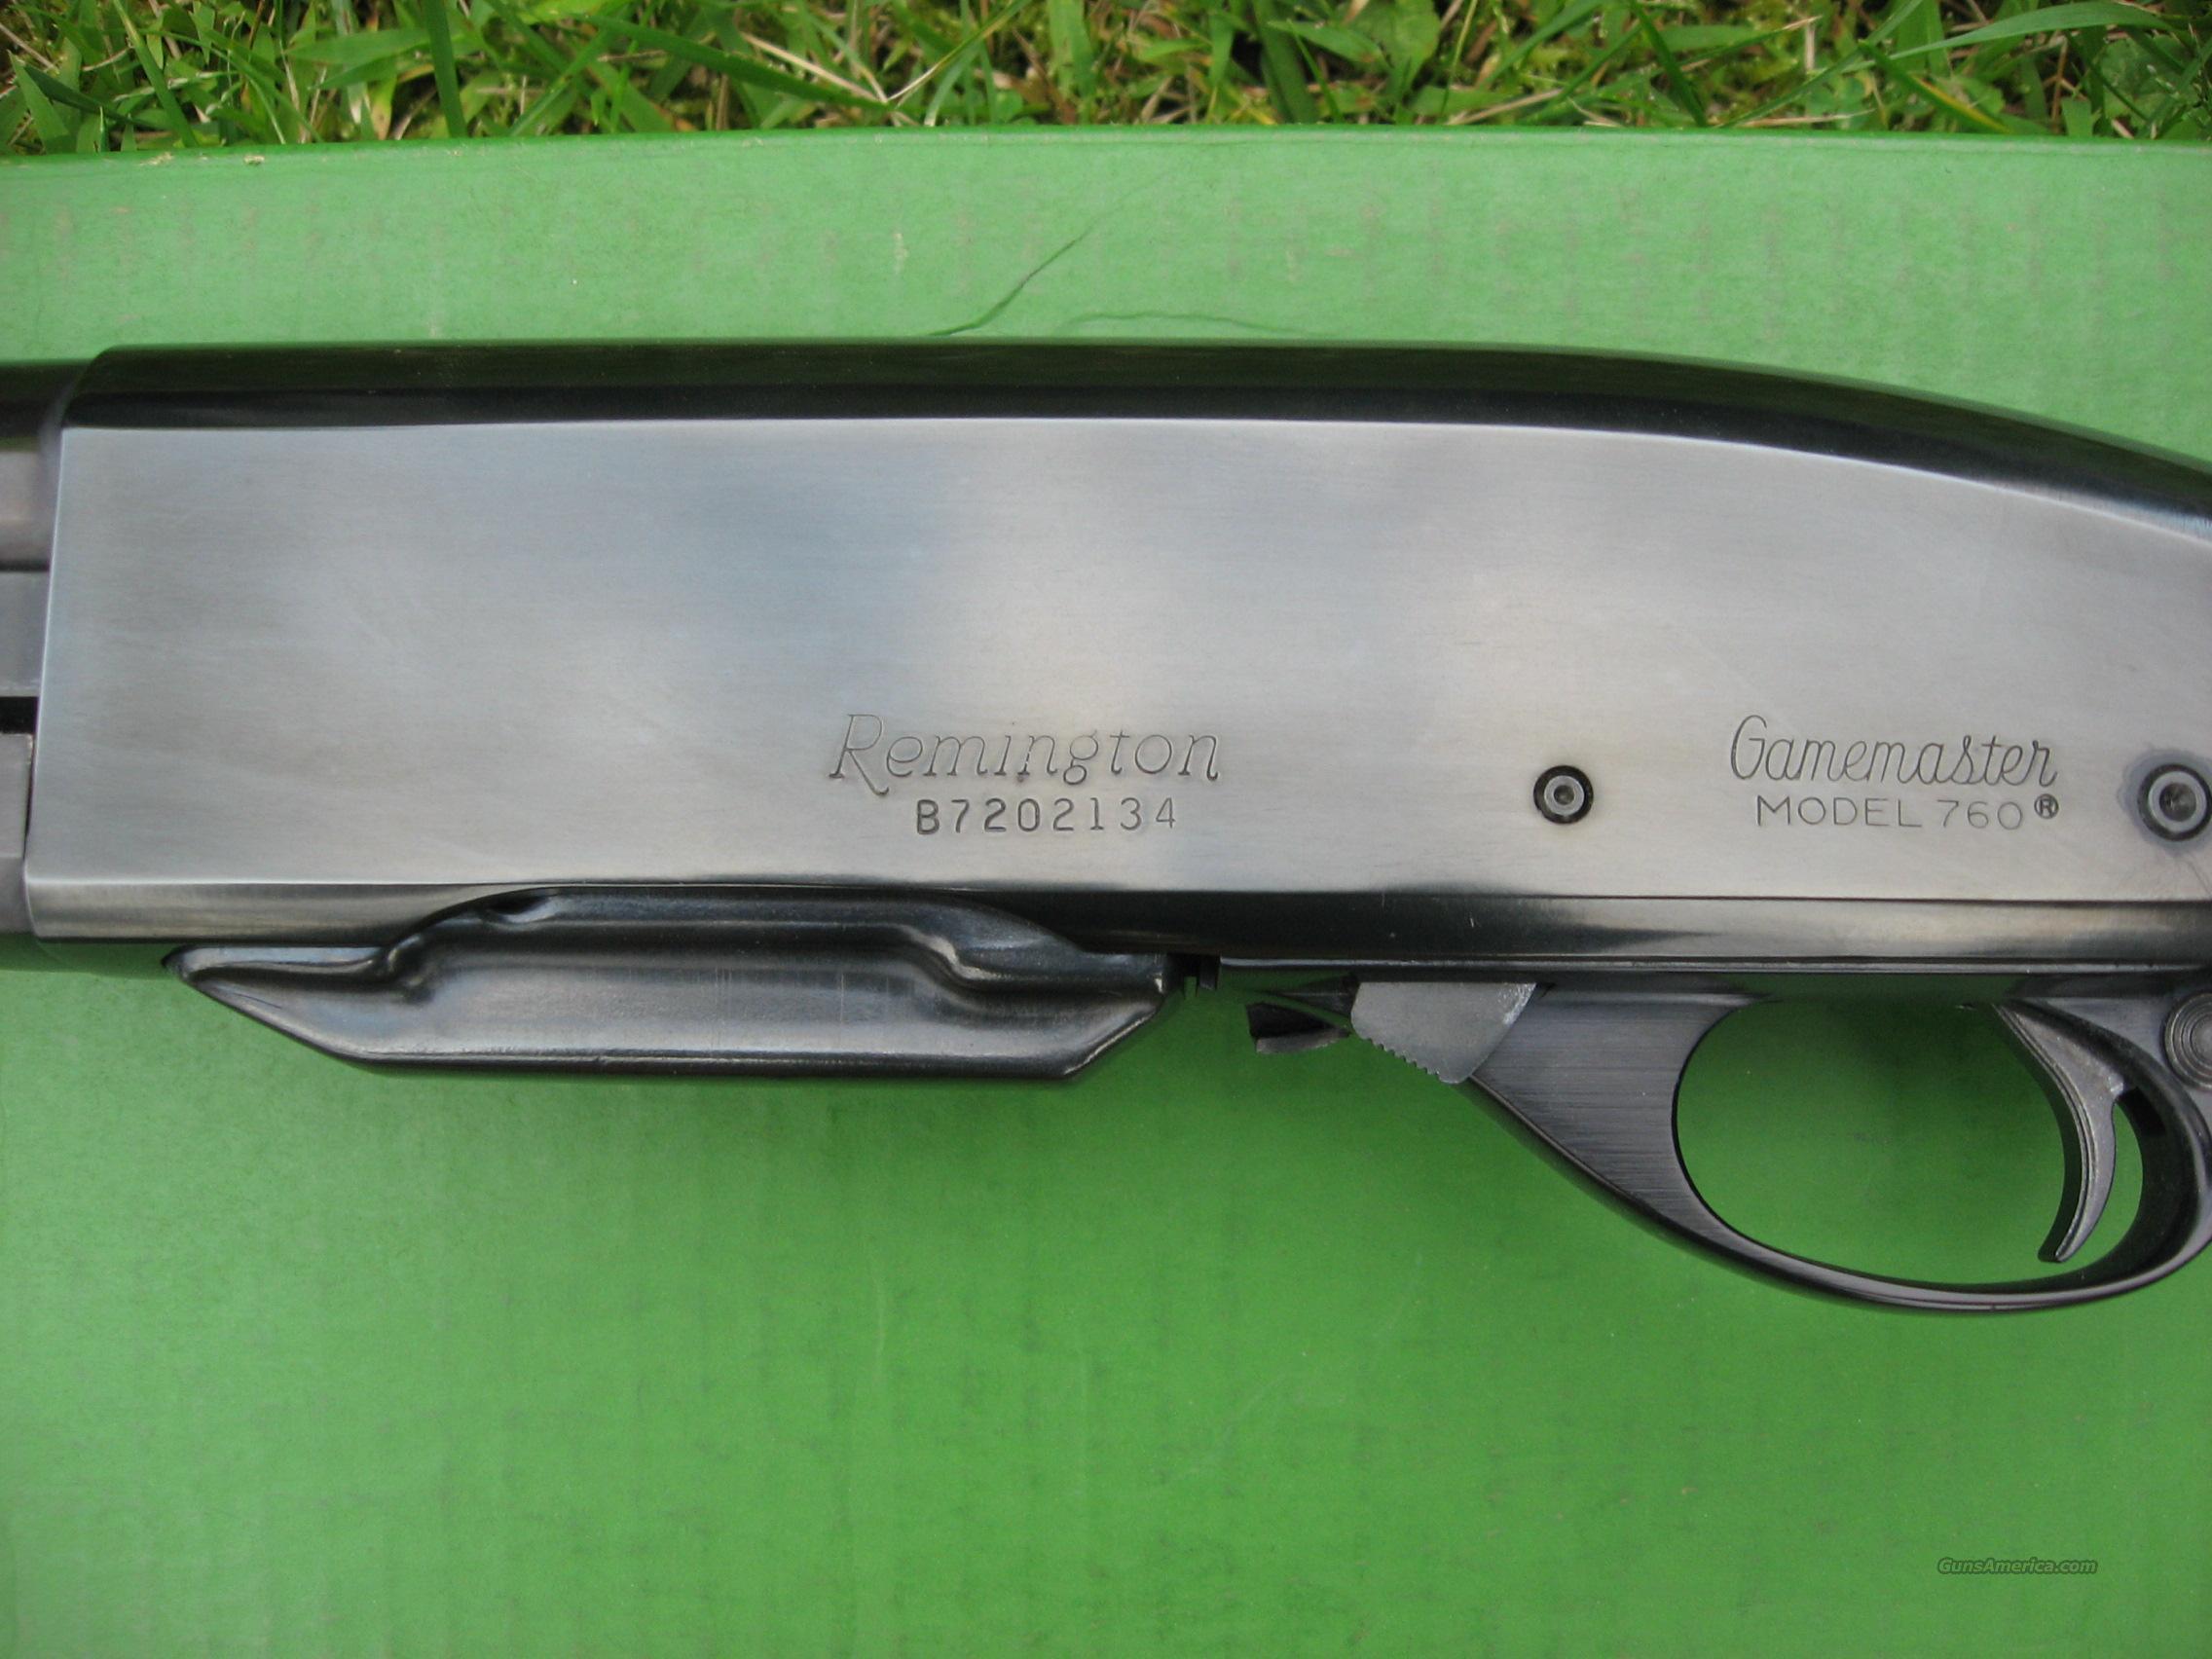 Remington 760 gamemaster 30-06 key generator